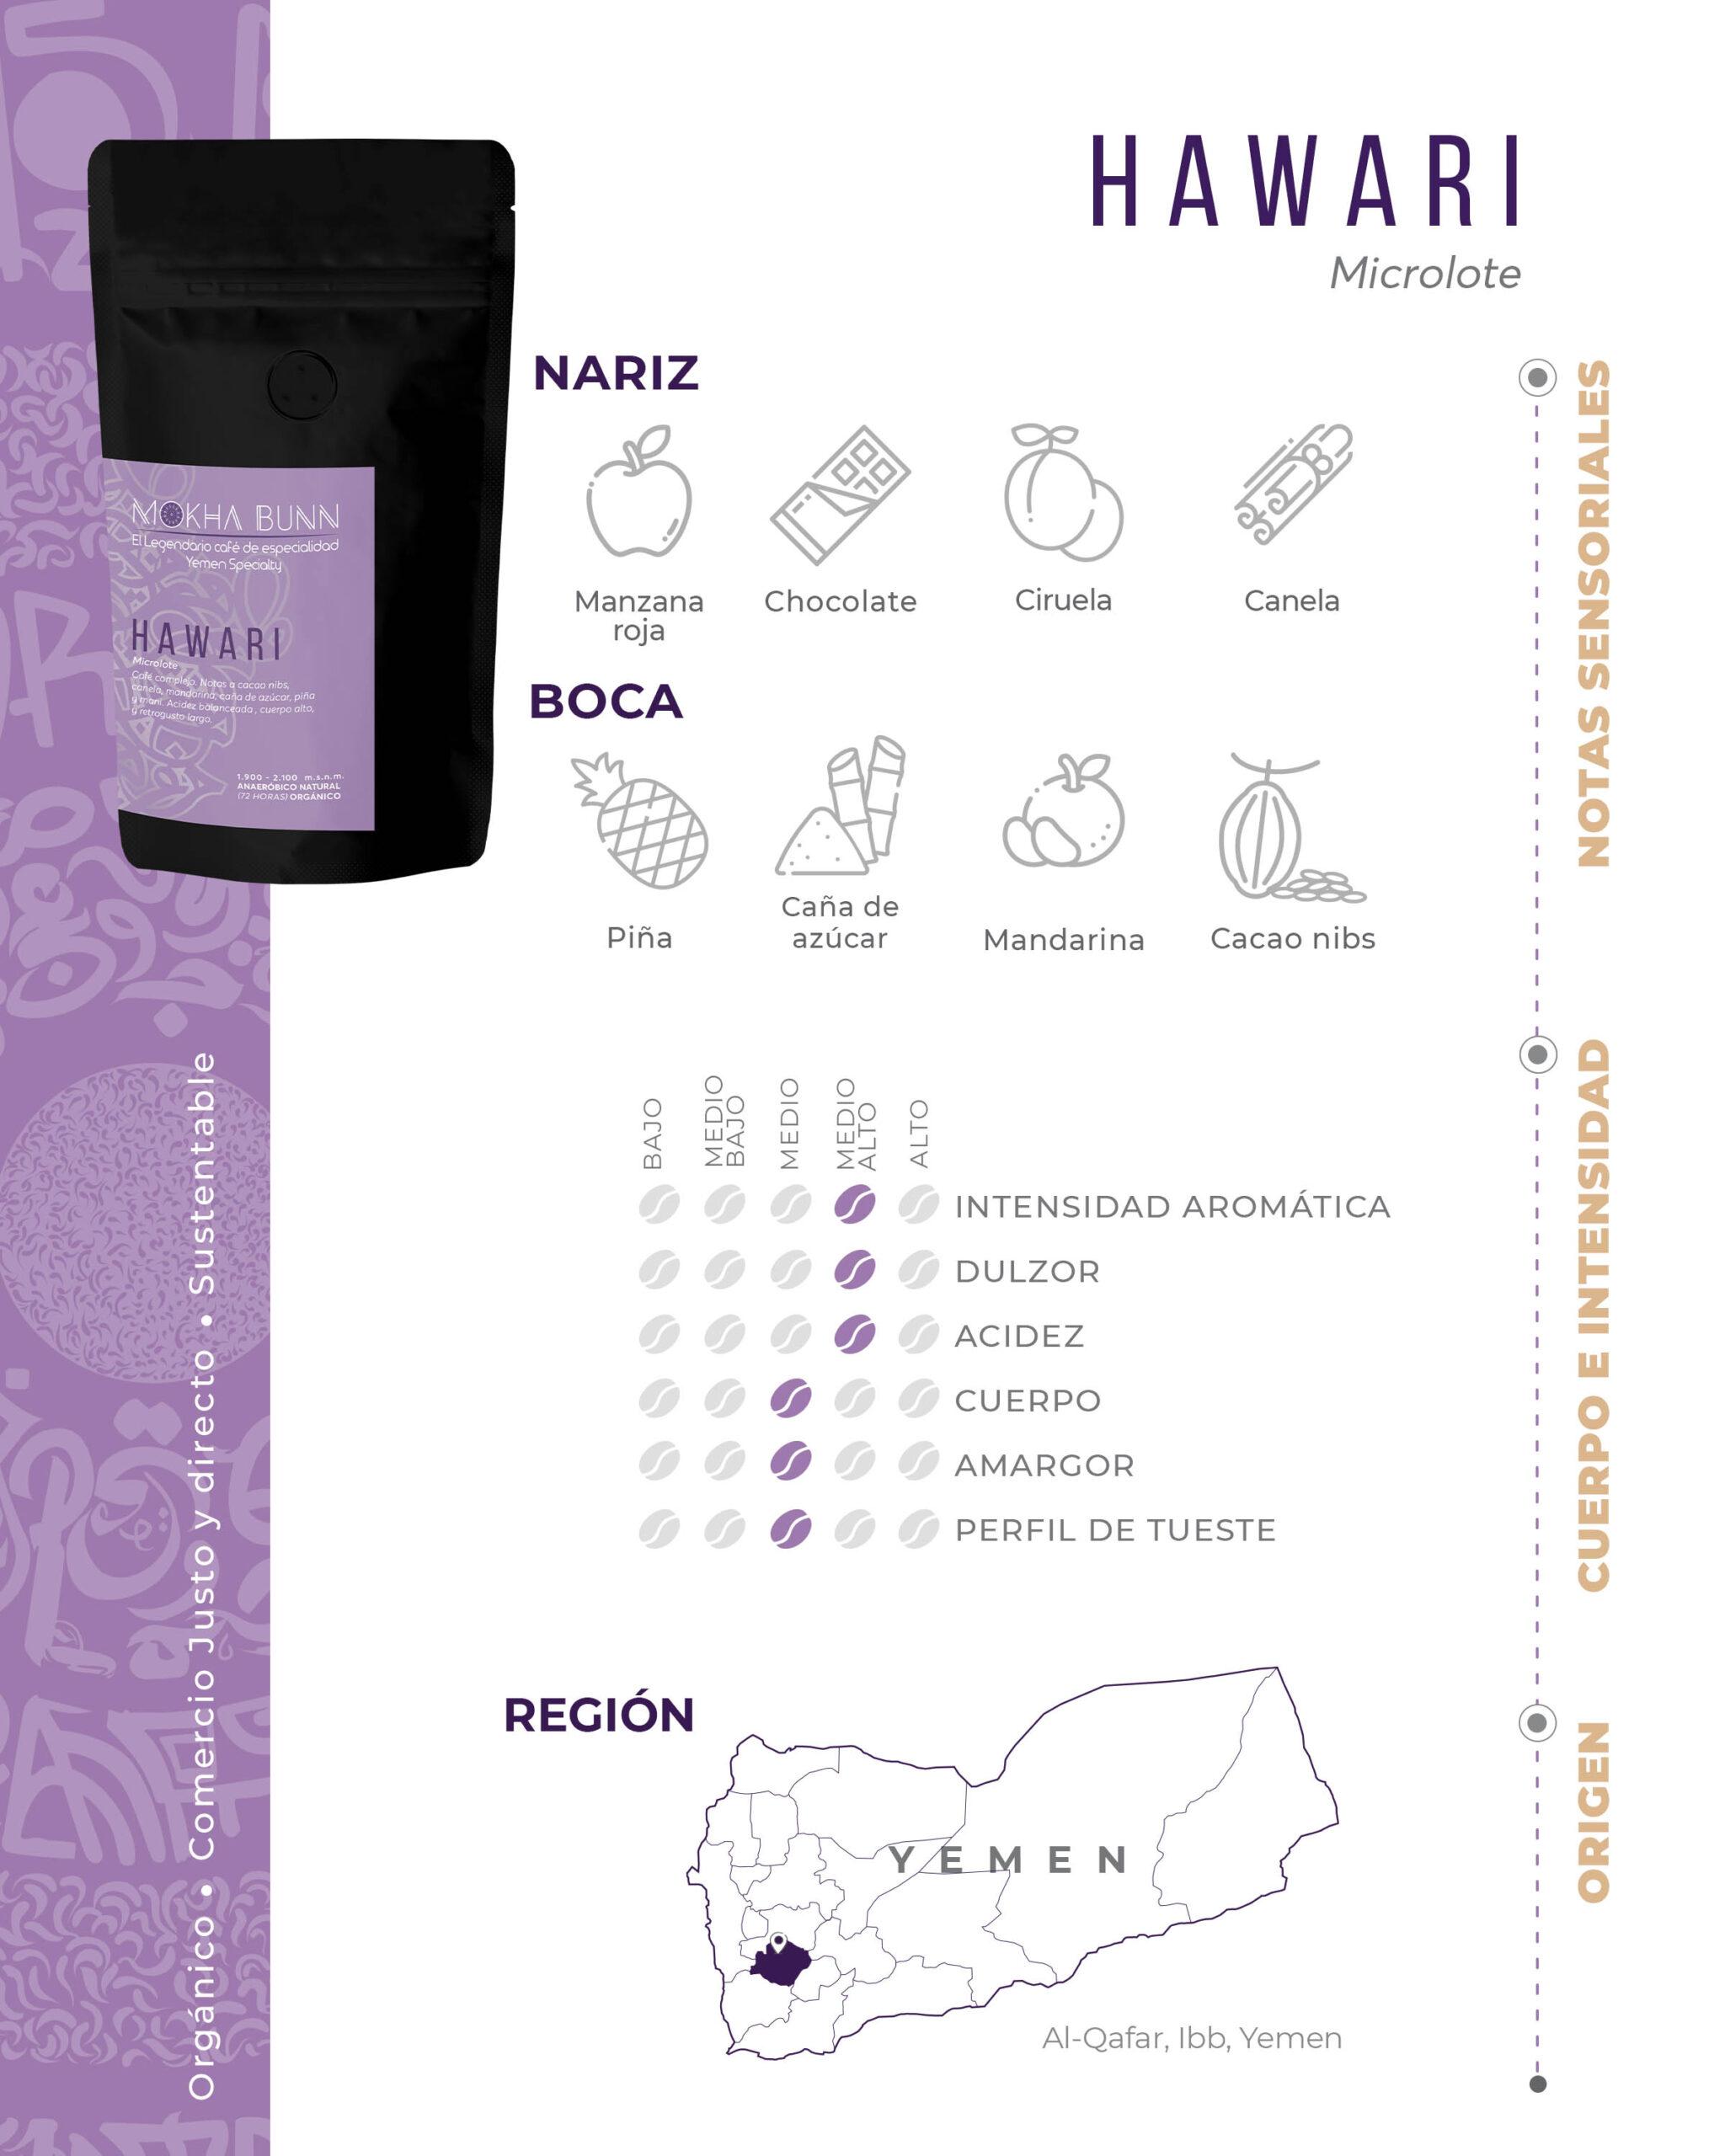 Hawari-cafe-de-especialidad-de-Yemen-Mokha-Bunn-Chile